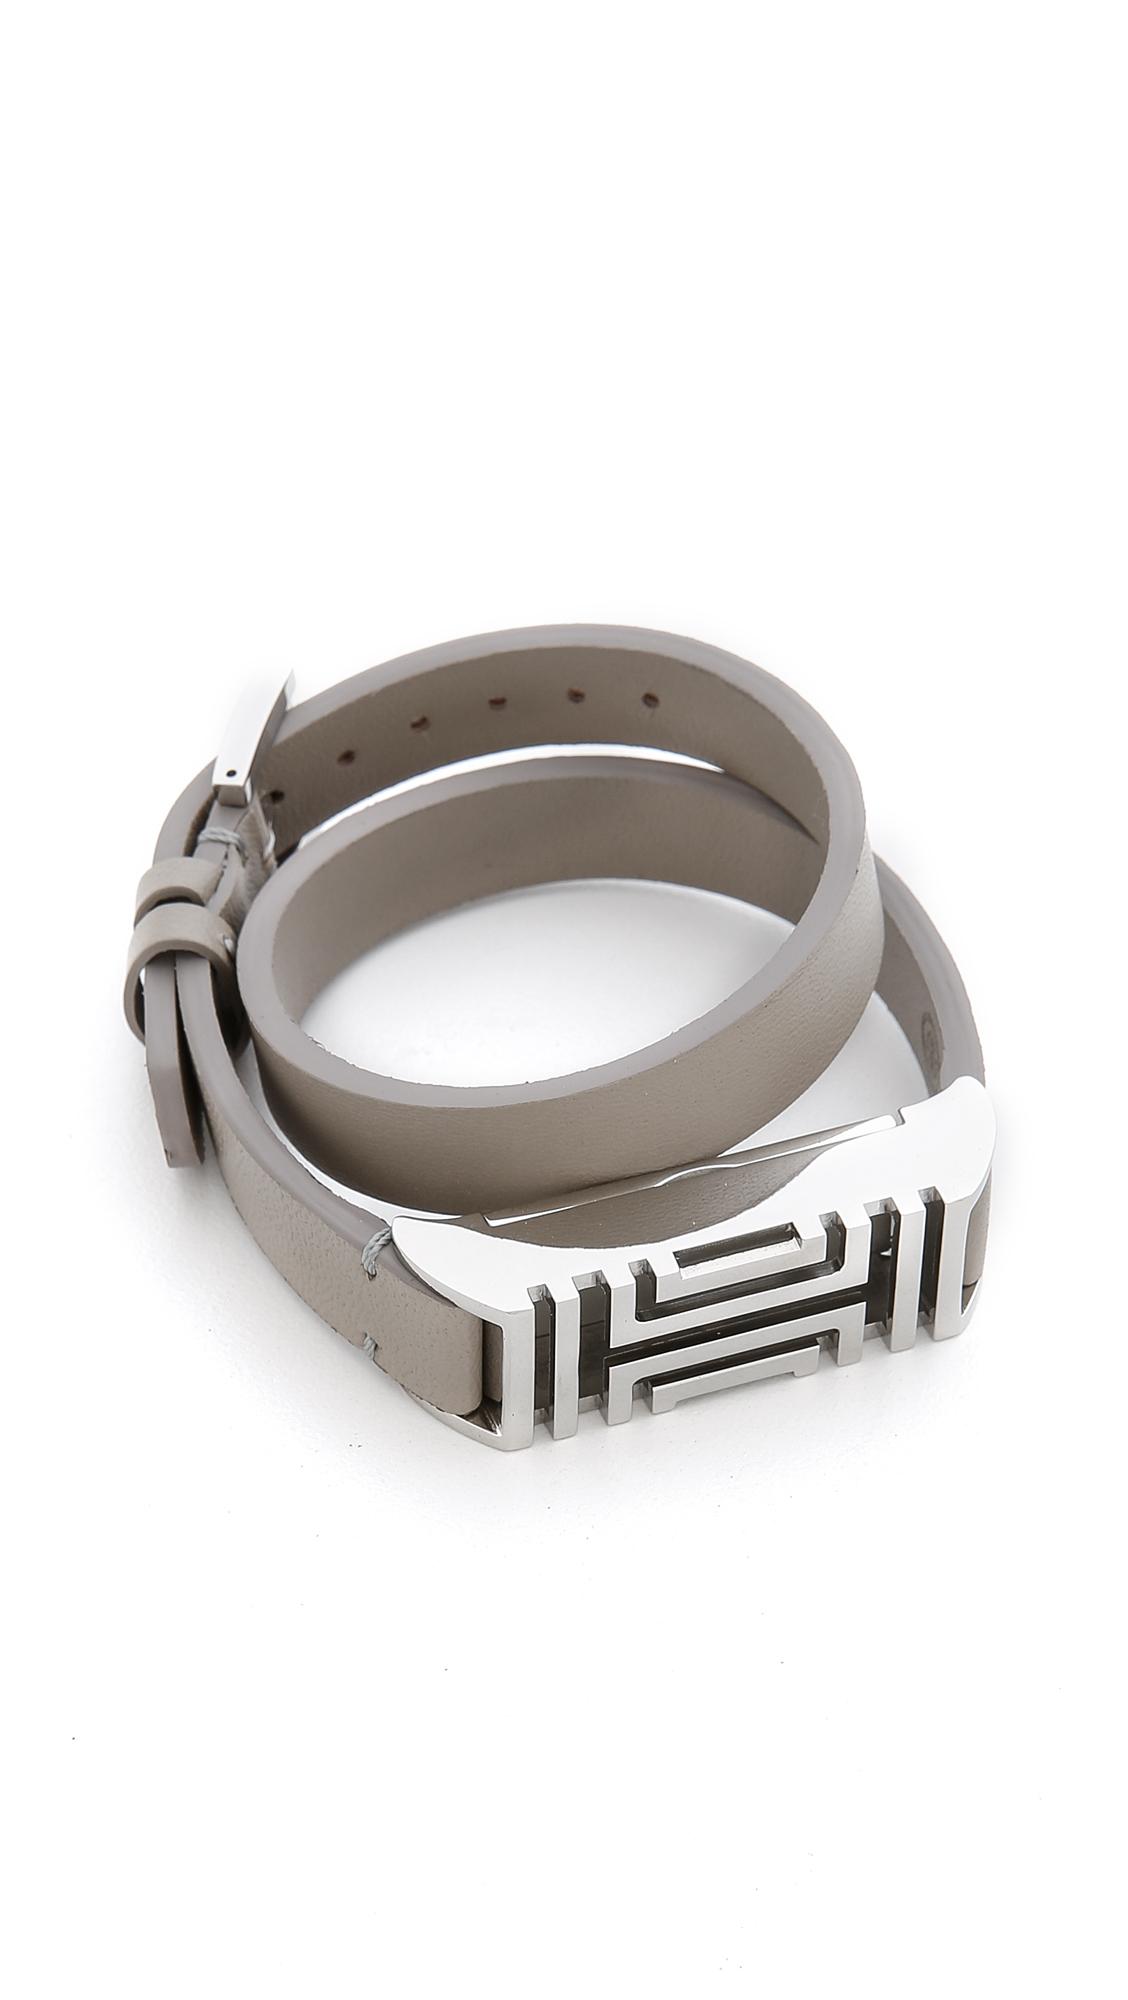 dbc55d0e4d6 Lyst - Tory Burch For Fitbit Fret Double Wrap Bracelet - French Gray ...